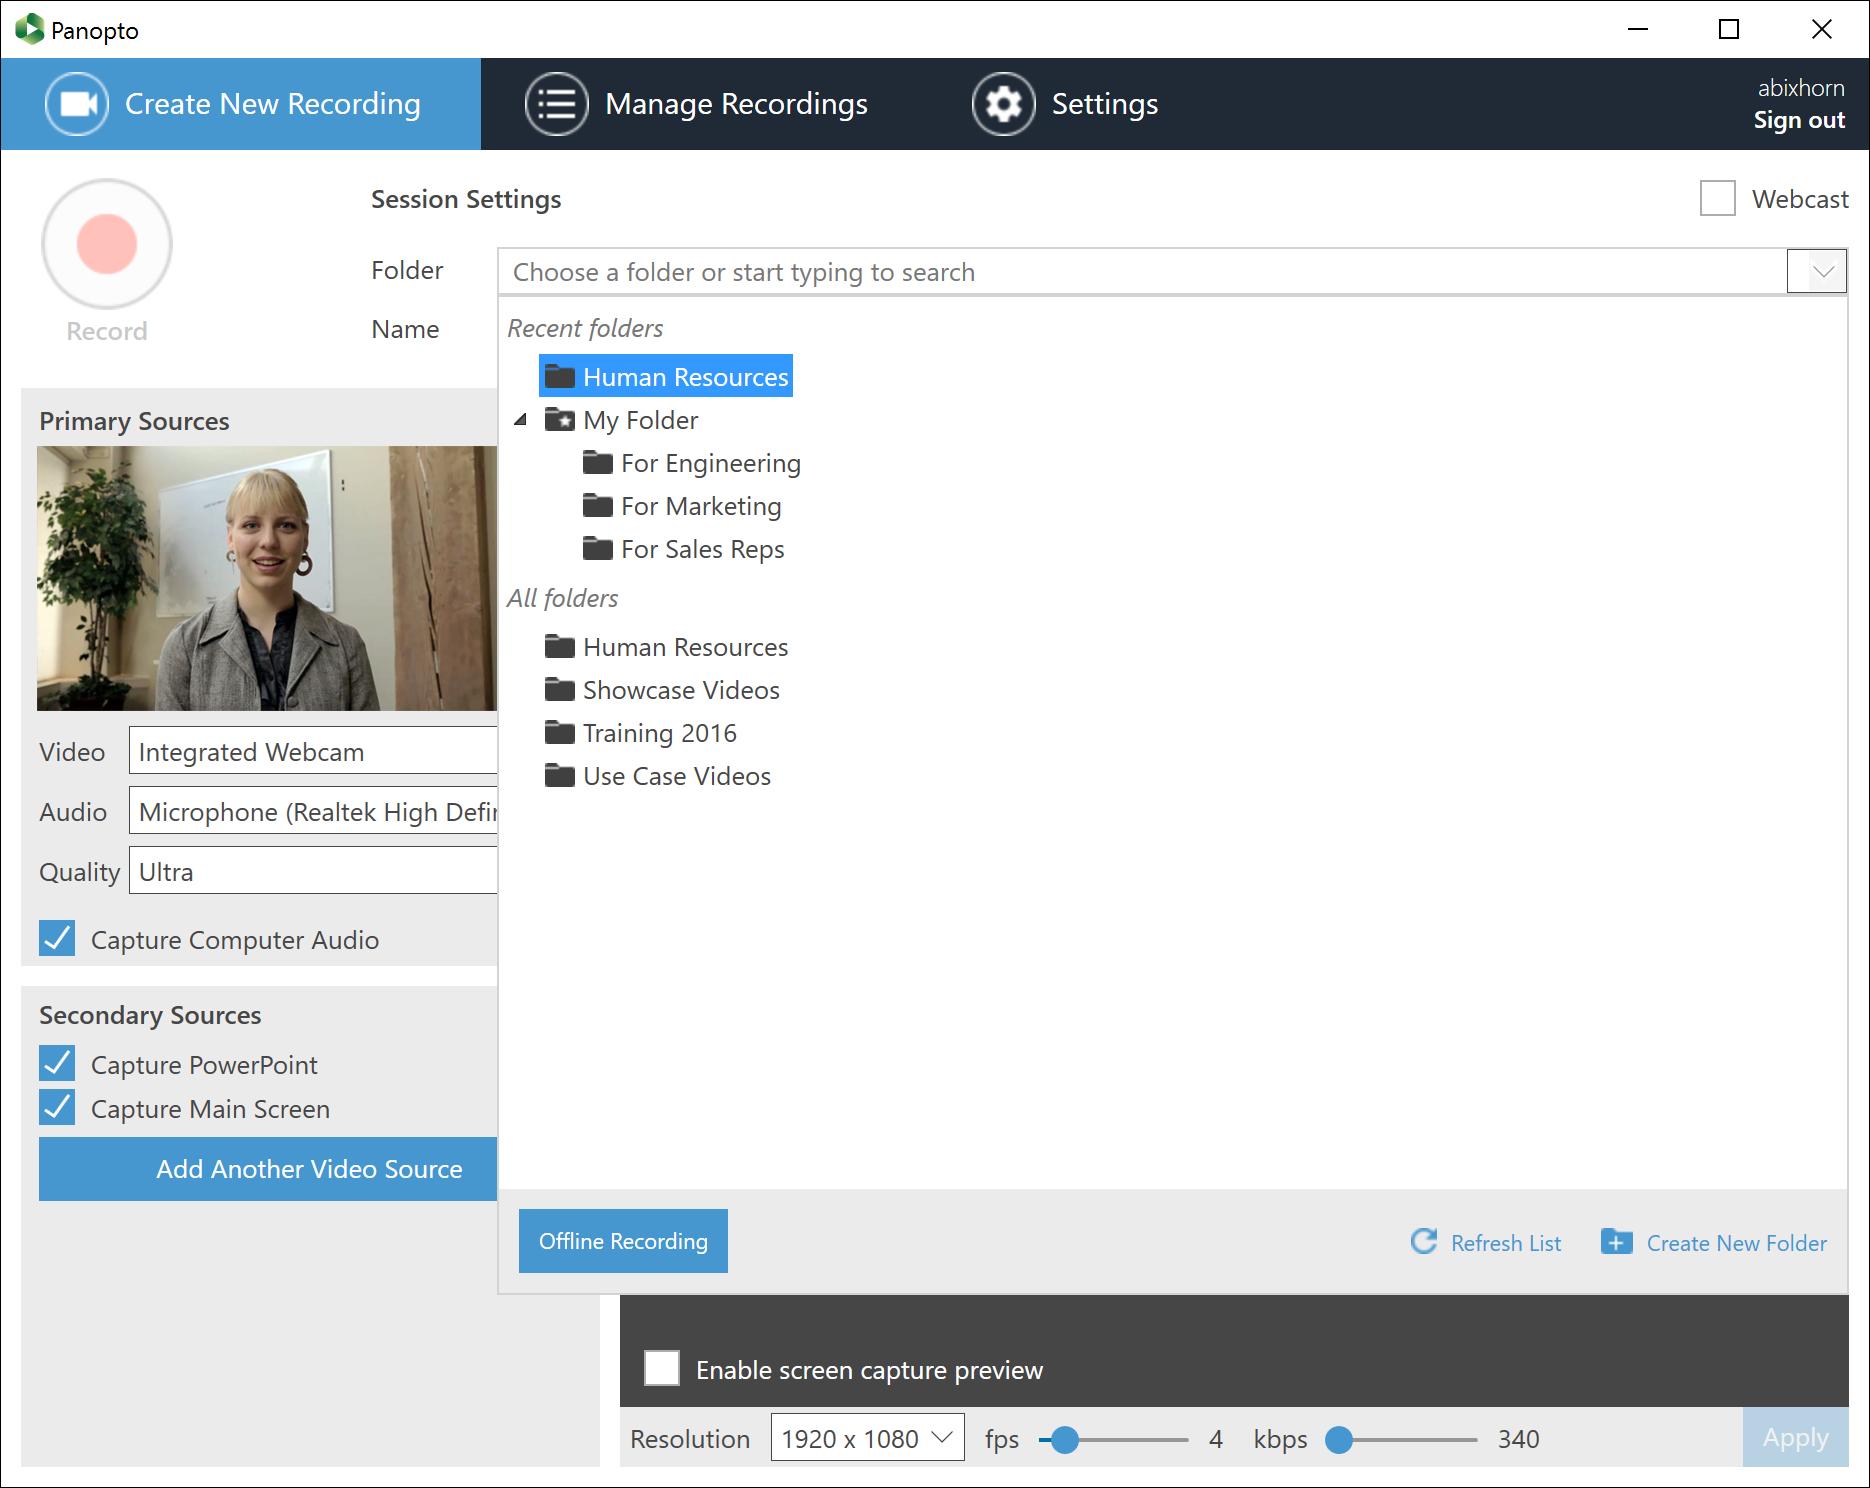 Folder Selector - Panopto Video Platform